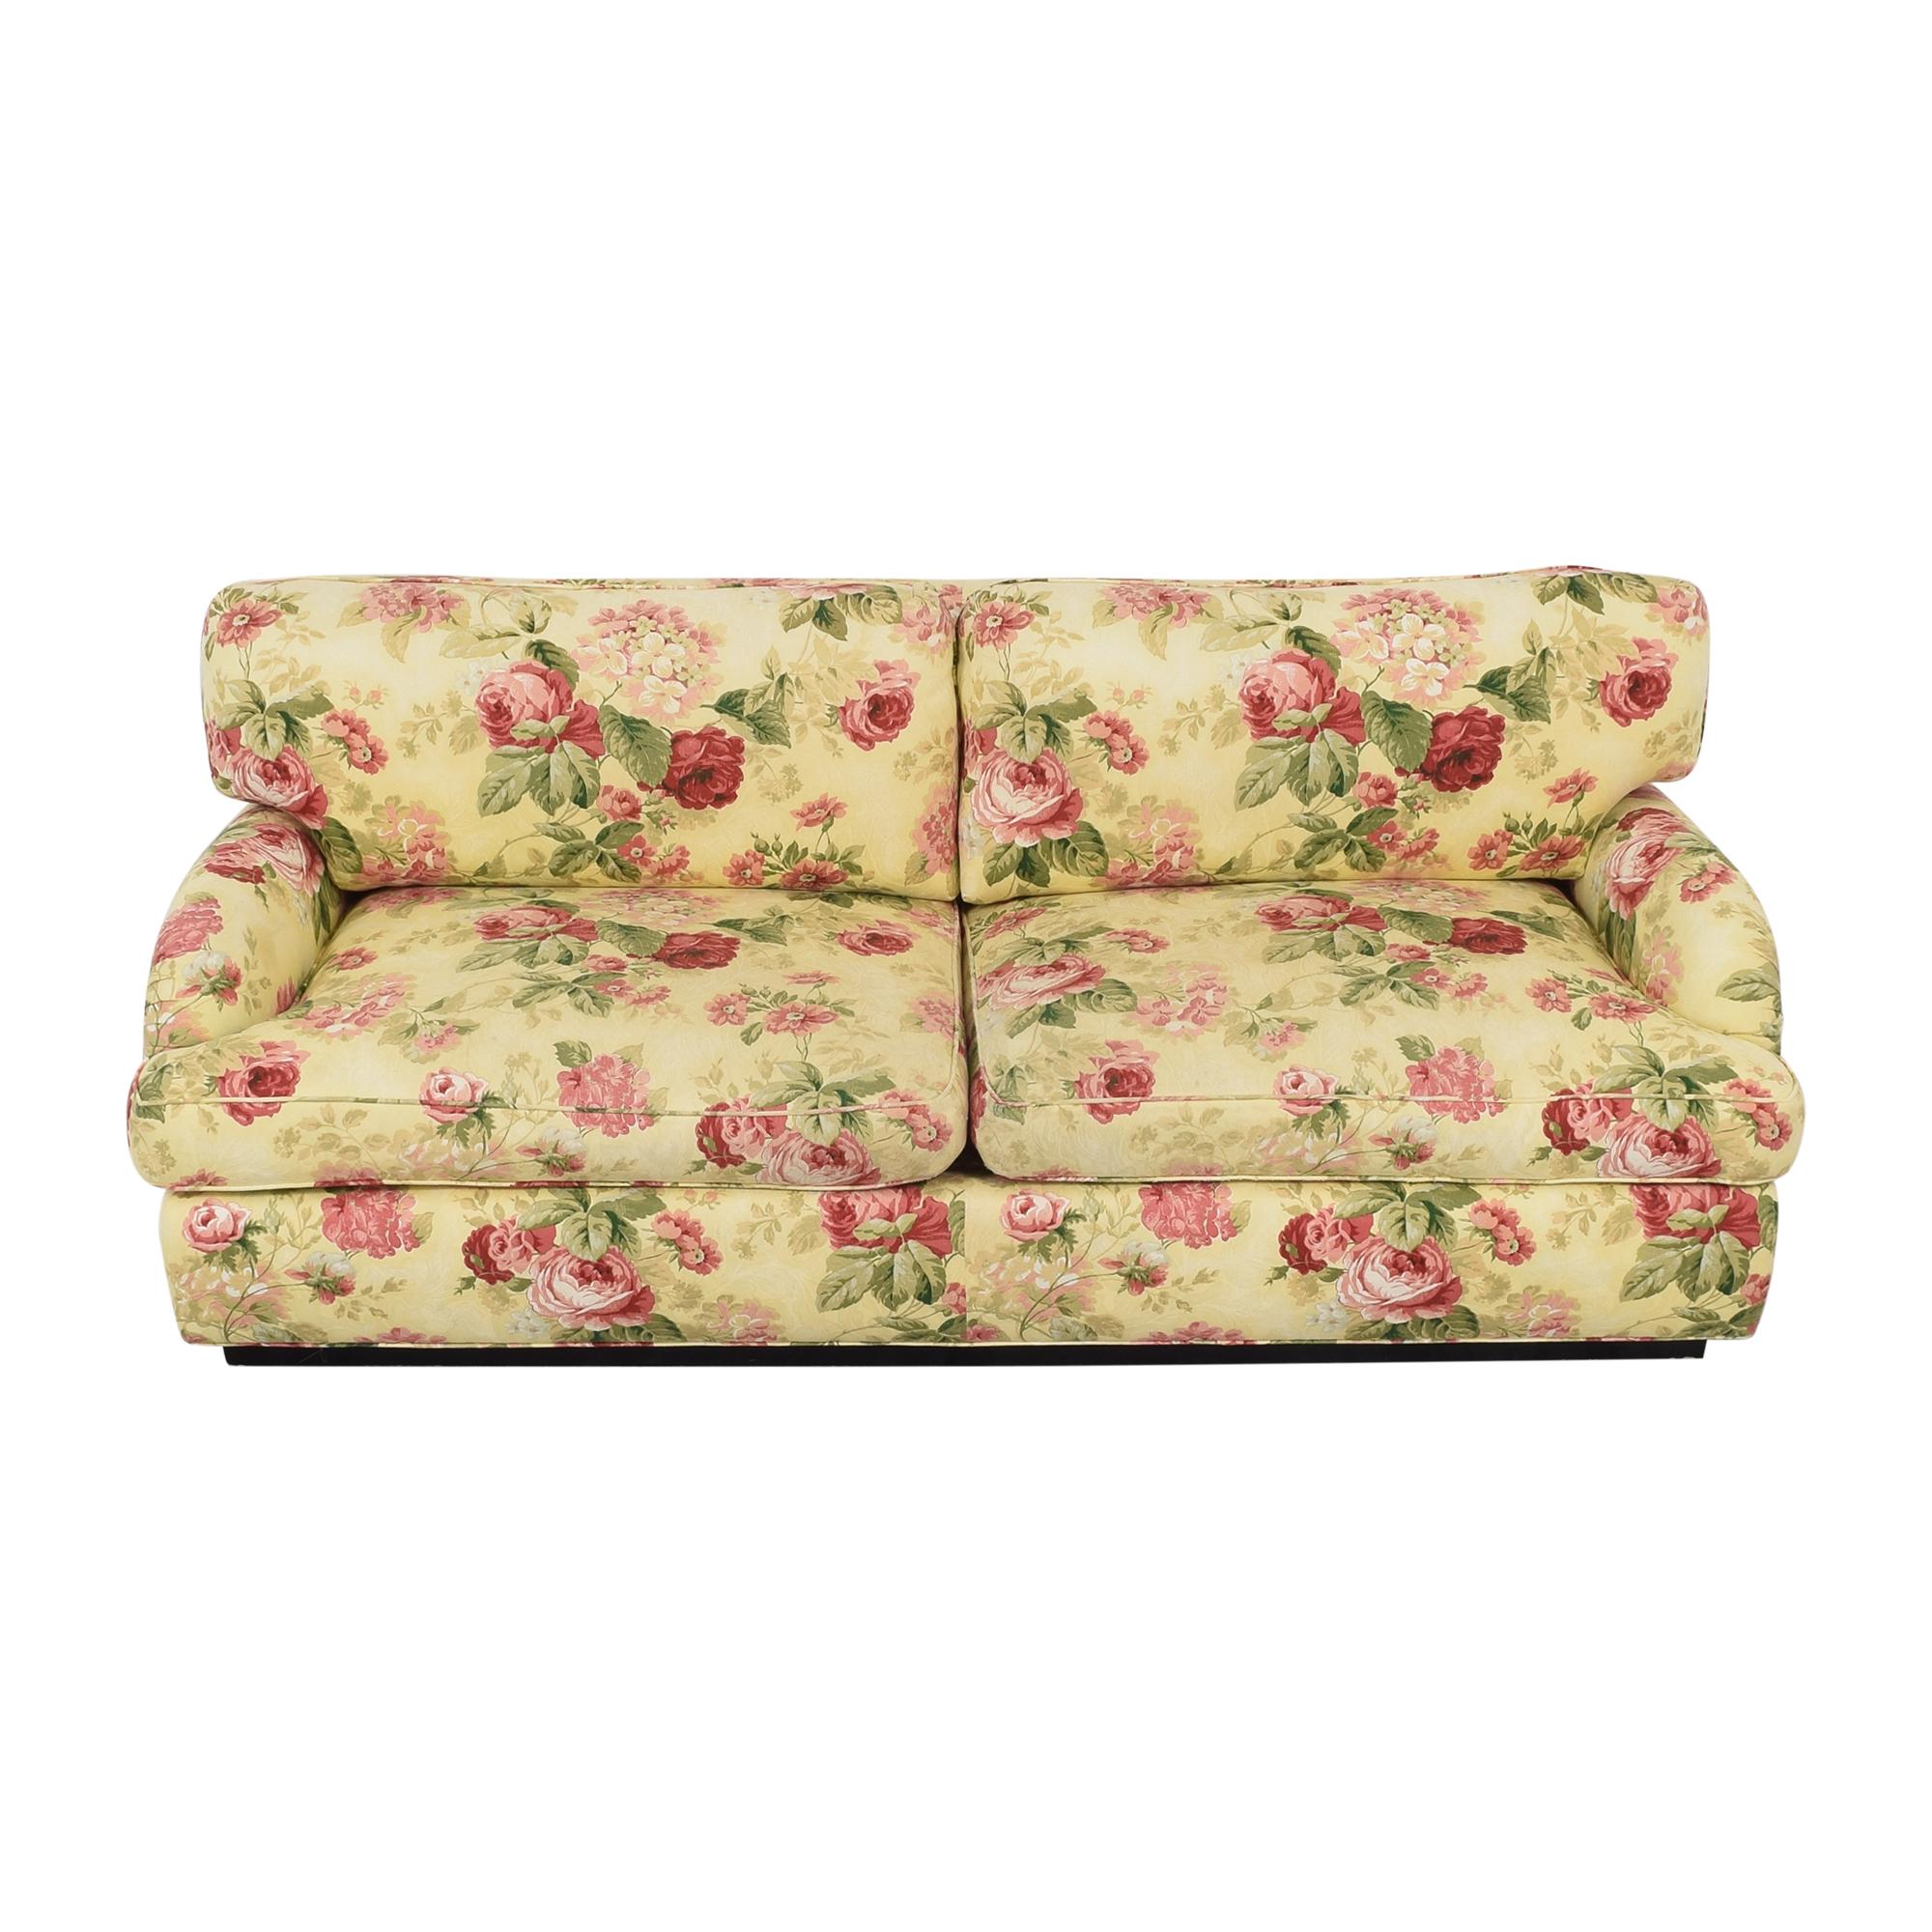 Greenbaum Interiors Greenbaum Two Cushion Sofa pa